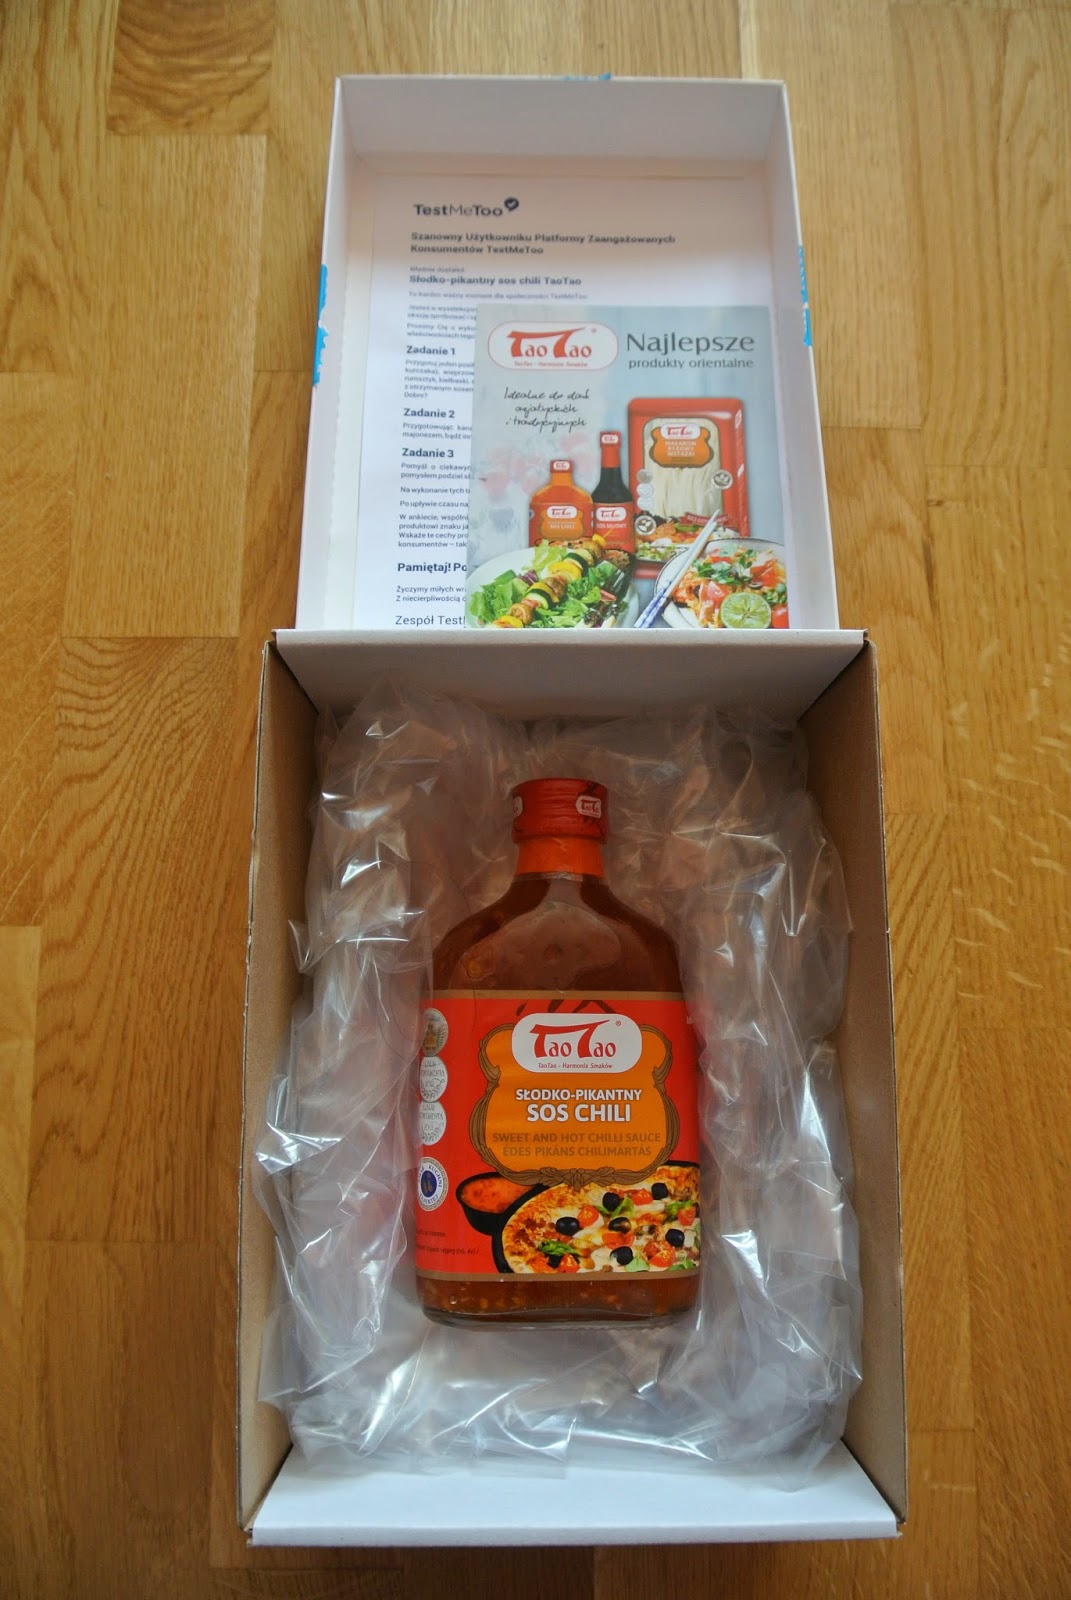 Testmetoo sos chili TaoTao słodko-pikantny